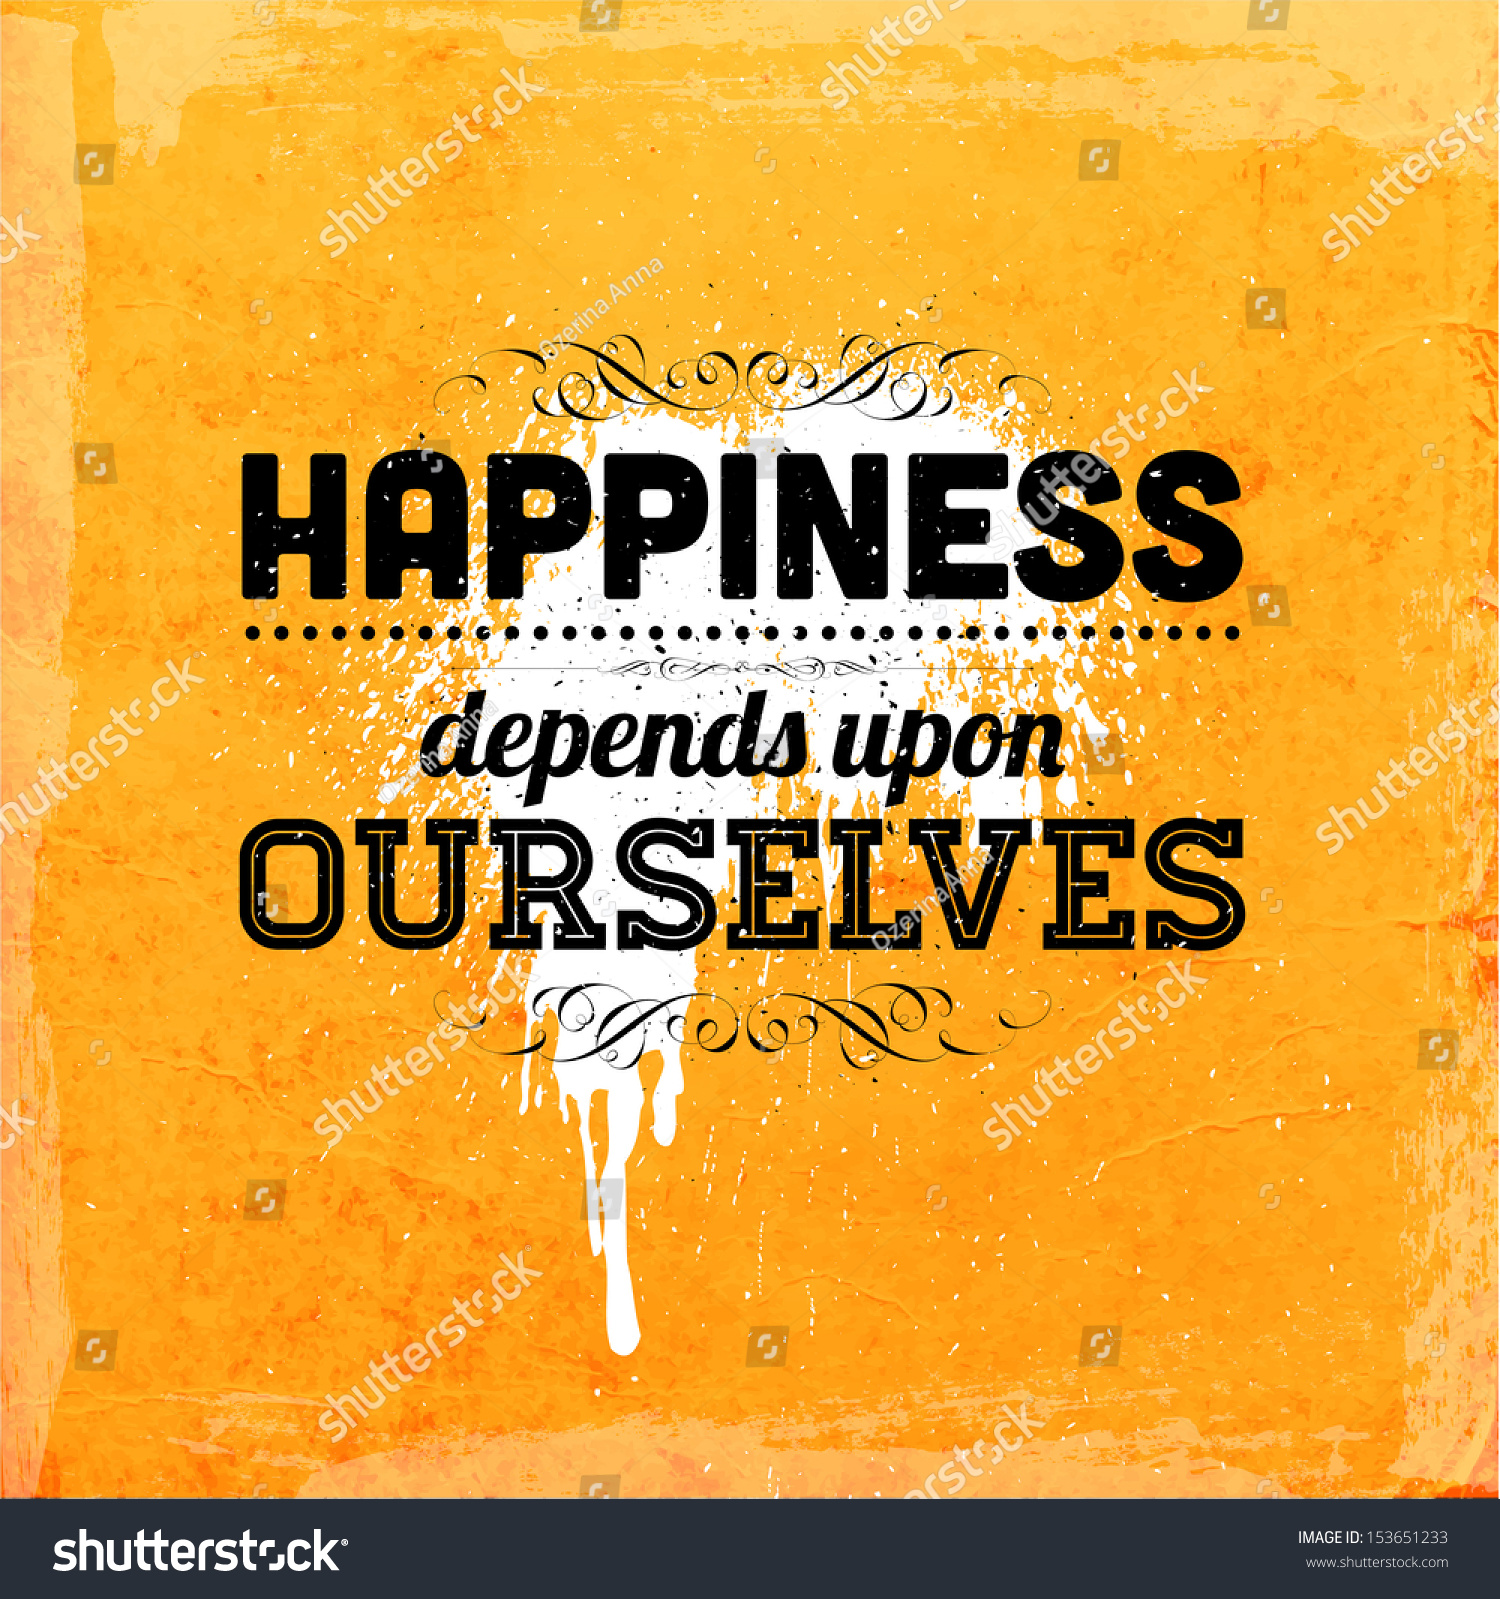 essays on happiness